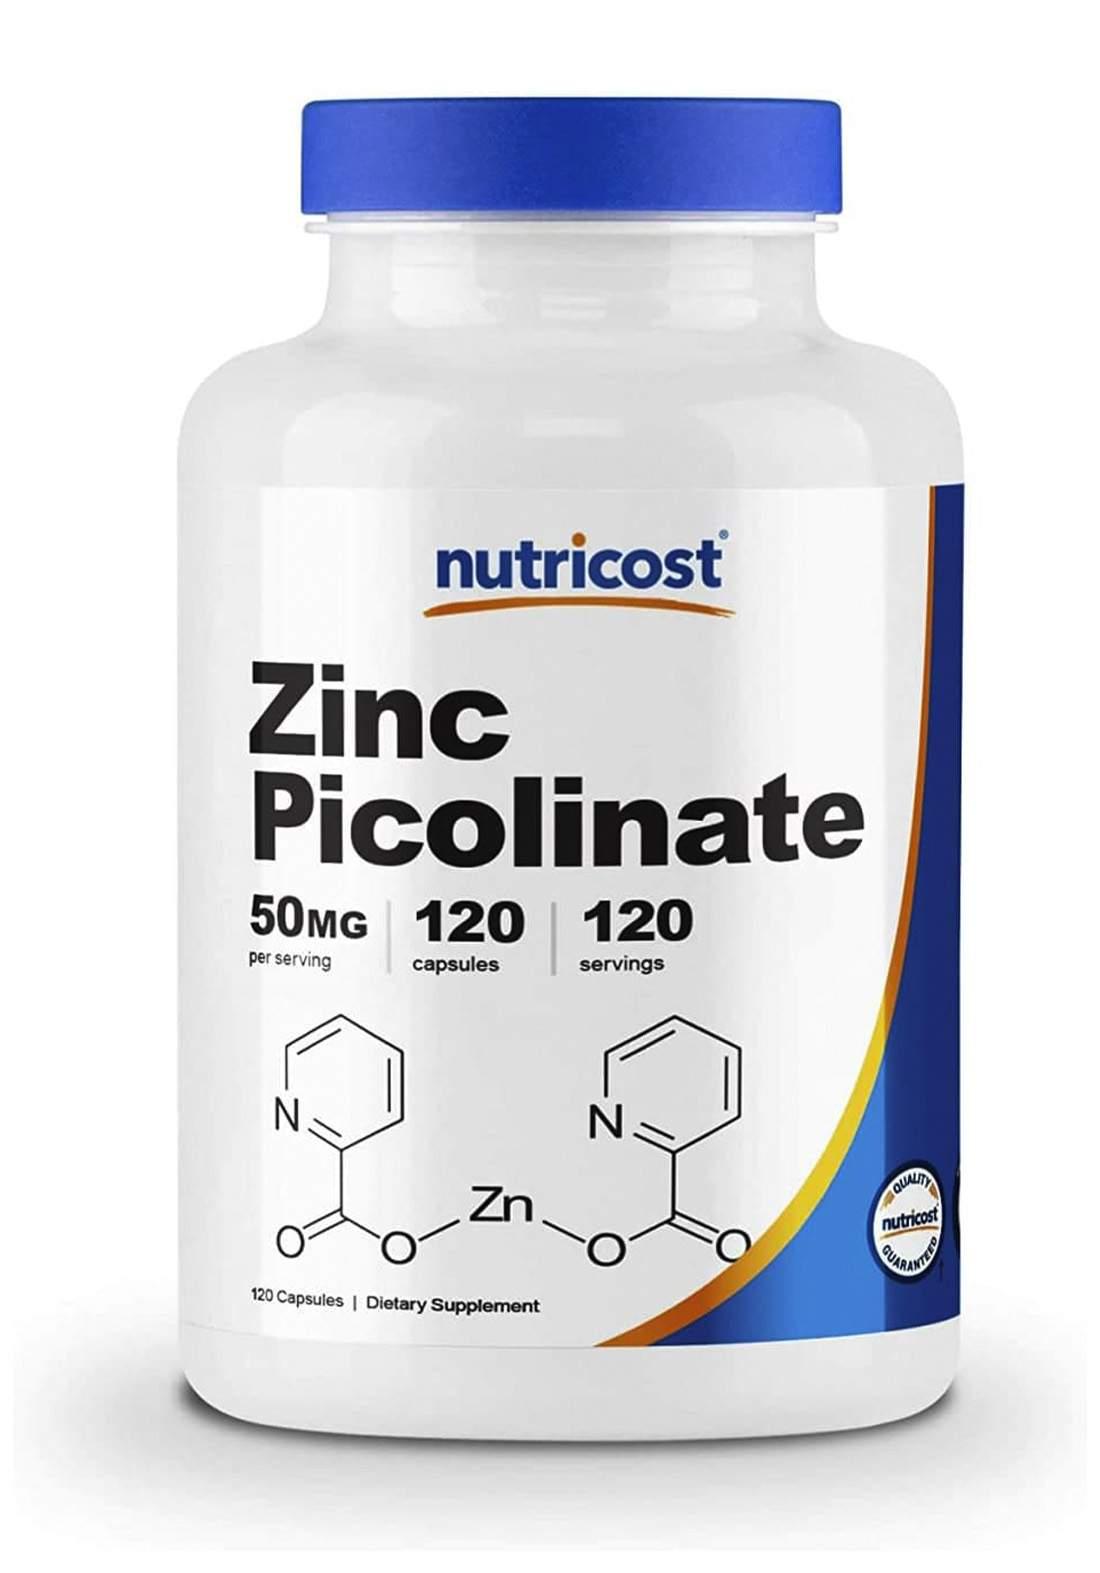 Nutricost Zinc Picolinate Food Supplement 50 mg 240 Capsules - فيتامين زنك240 كبسولة